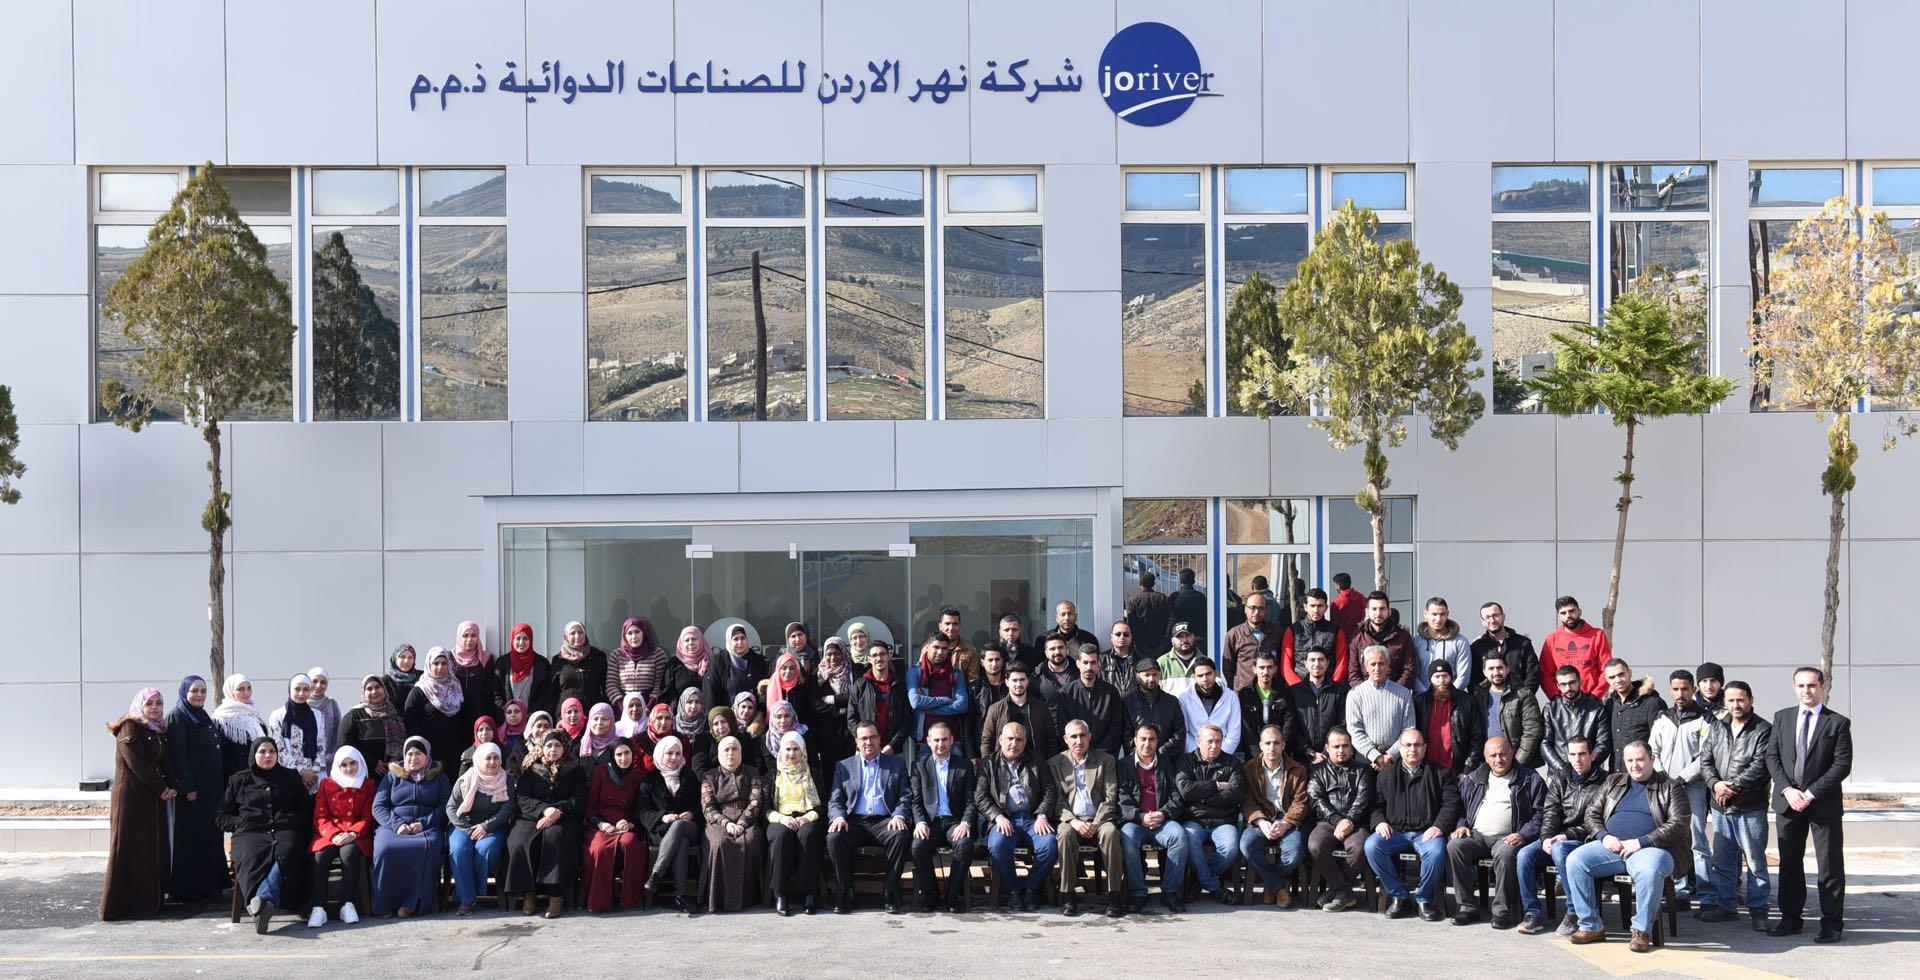 Jordan River Pharmaceuticals Company | Jerusalem